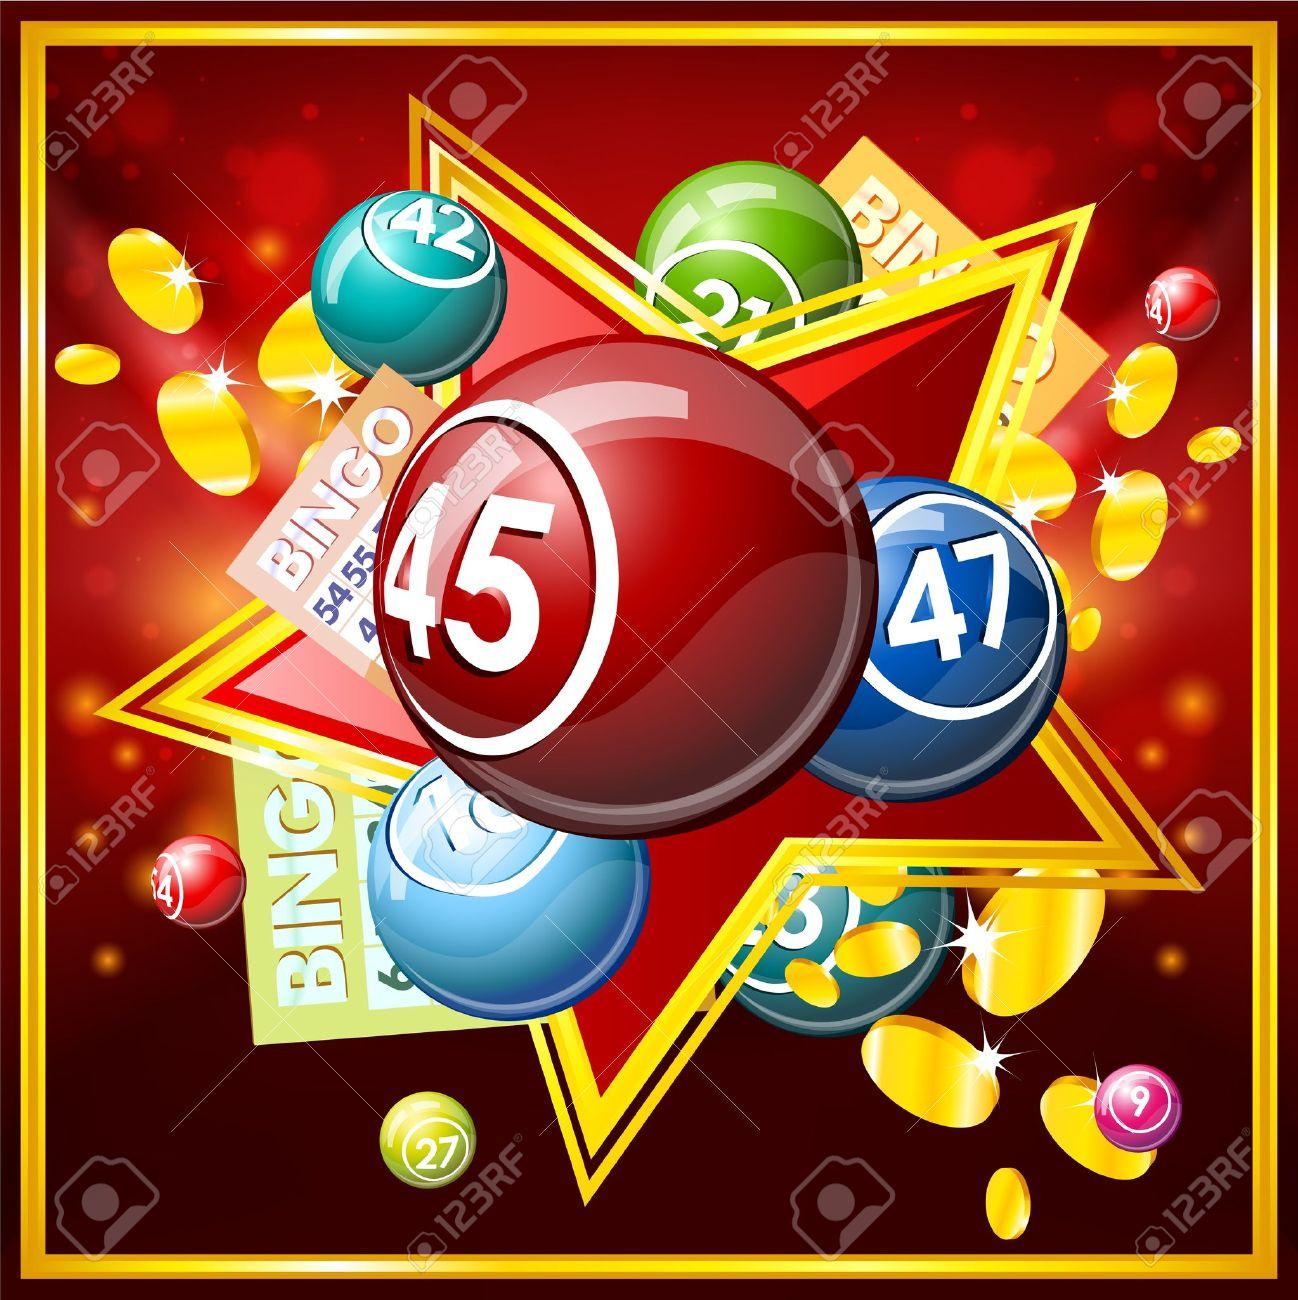 Super Punjab Original |satta punjab | Lottery| mms satta